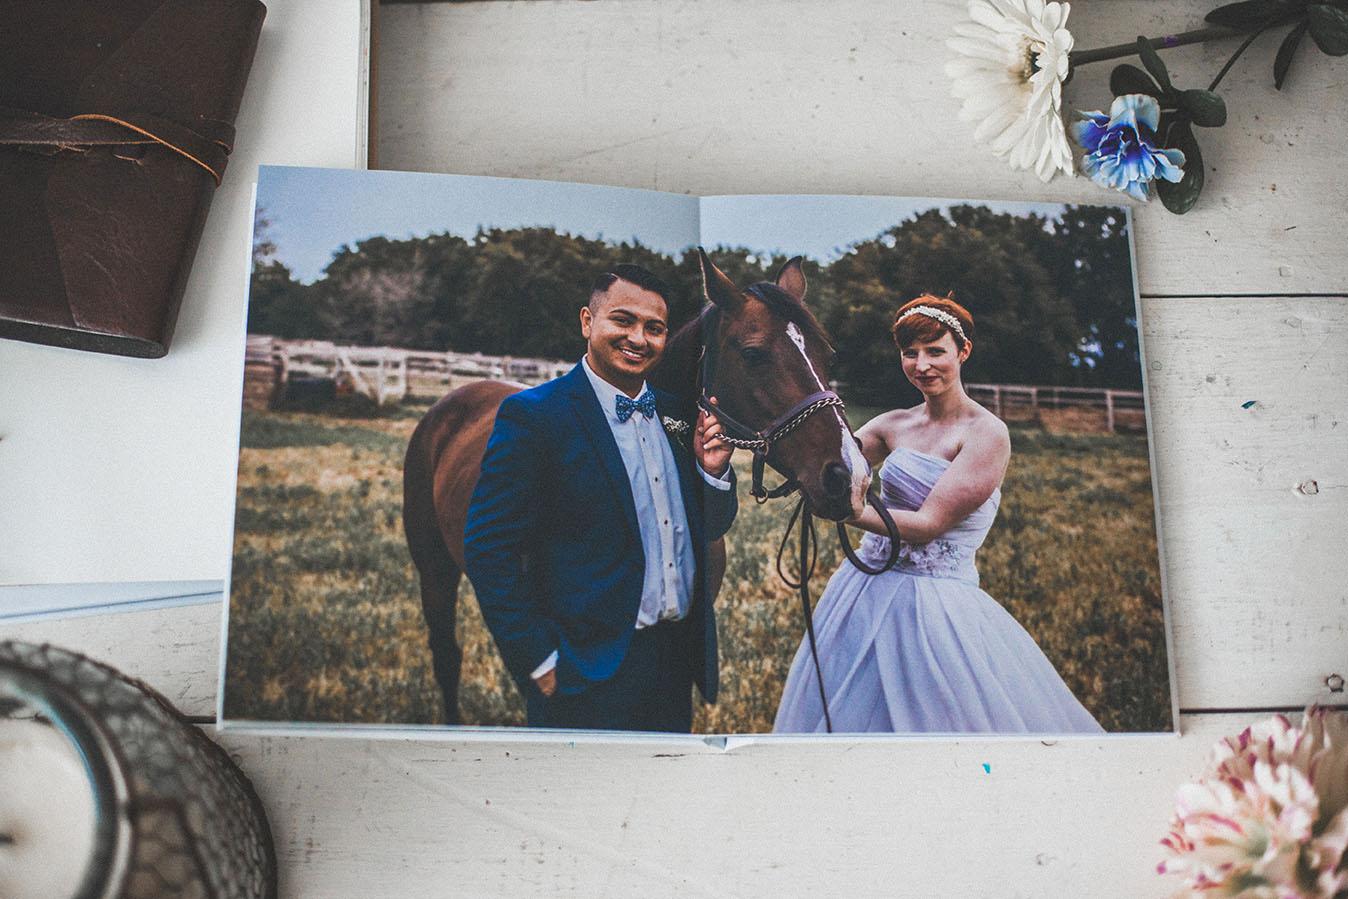 MA_WeddingBook-5.jpg